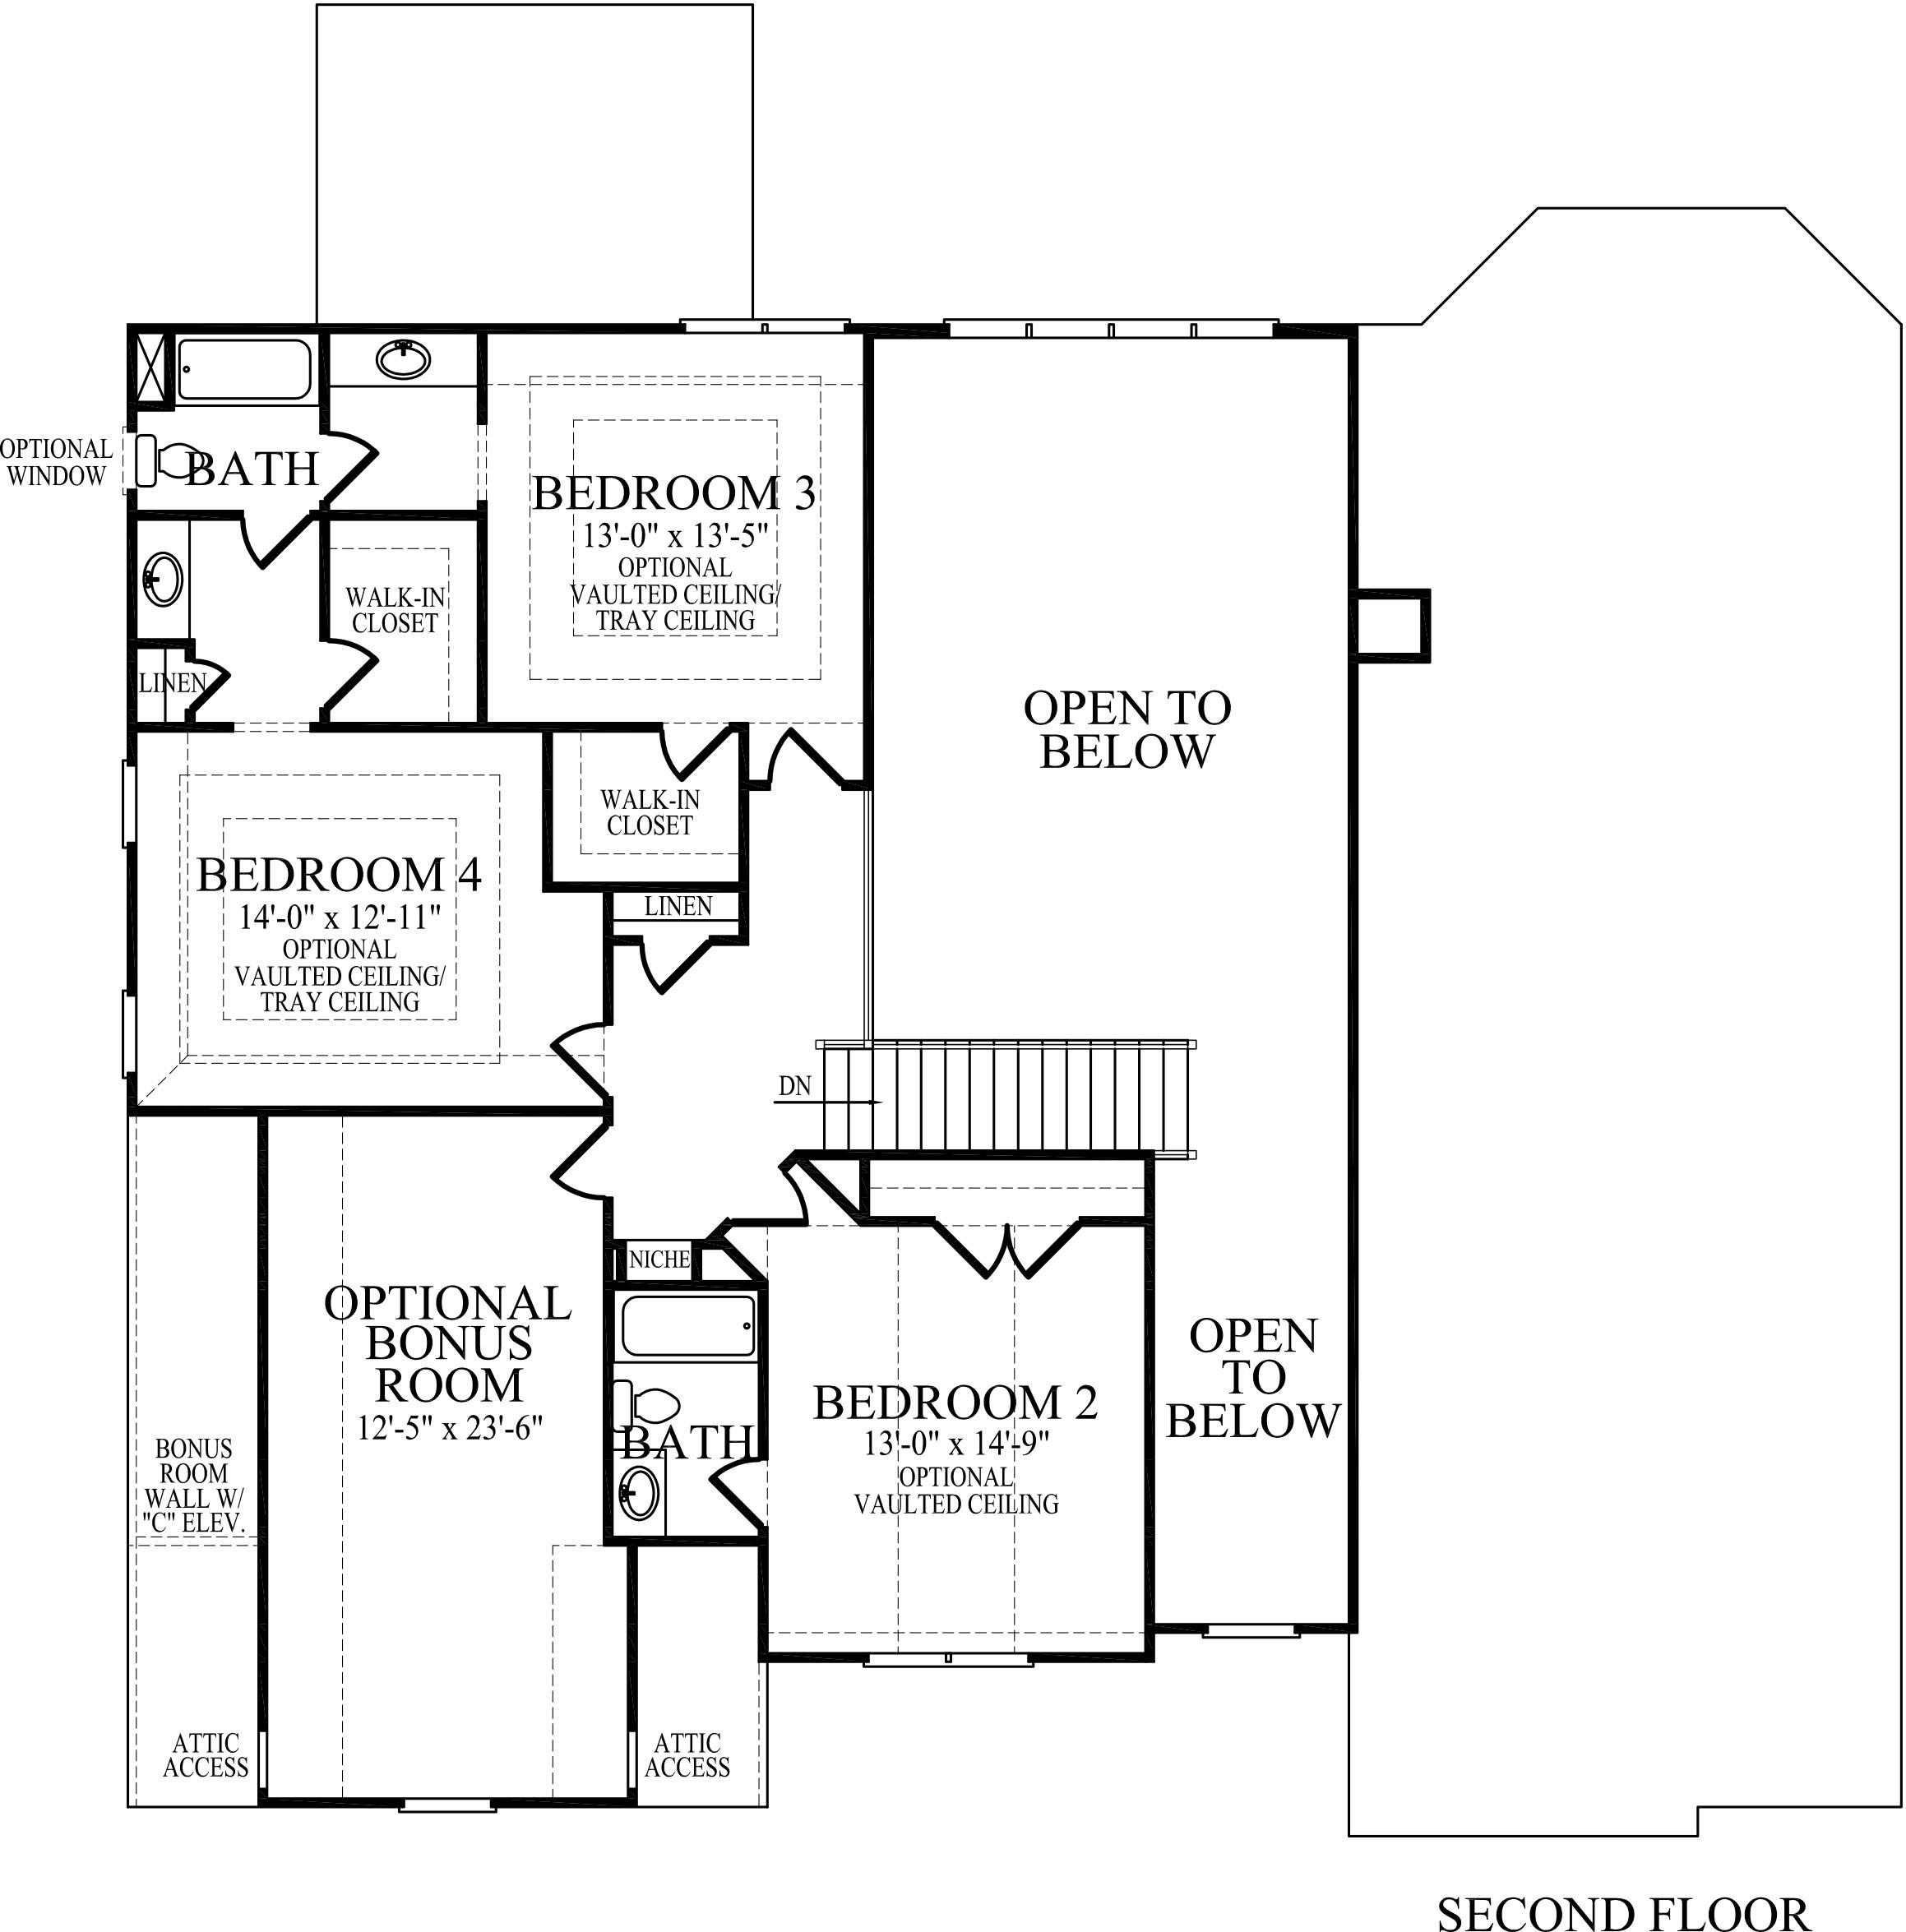 Photo barrington floor plan images plantation homes for Barrington floor plan